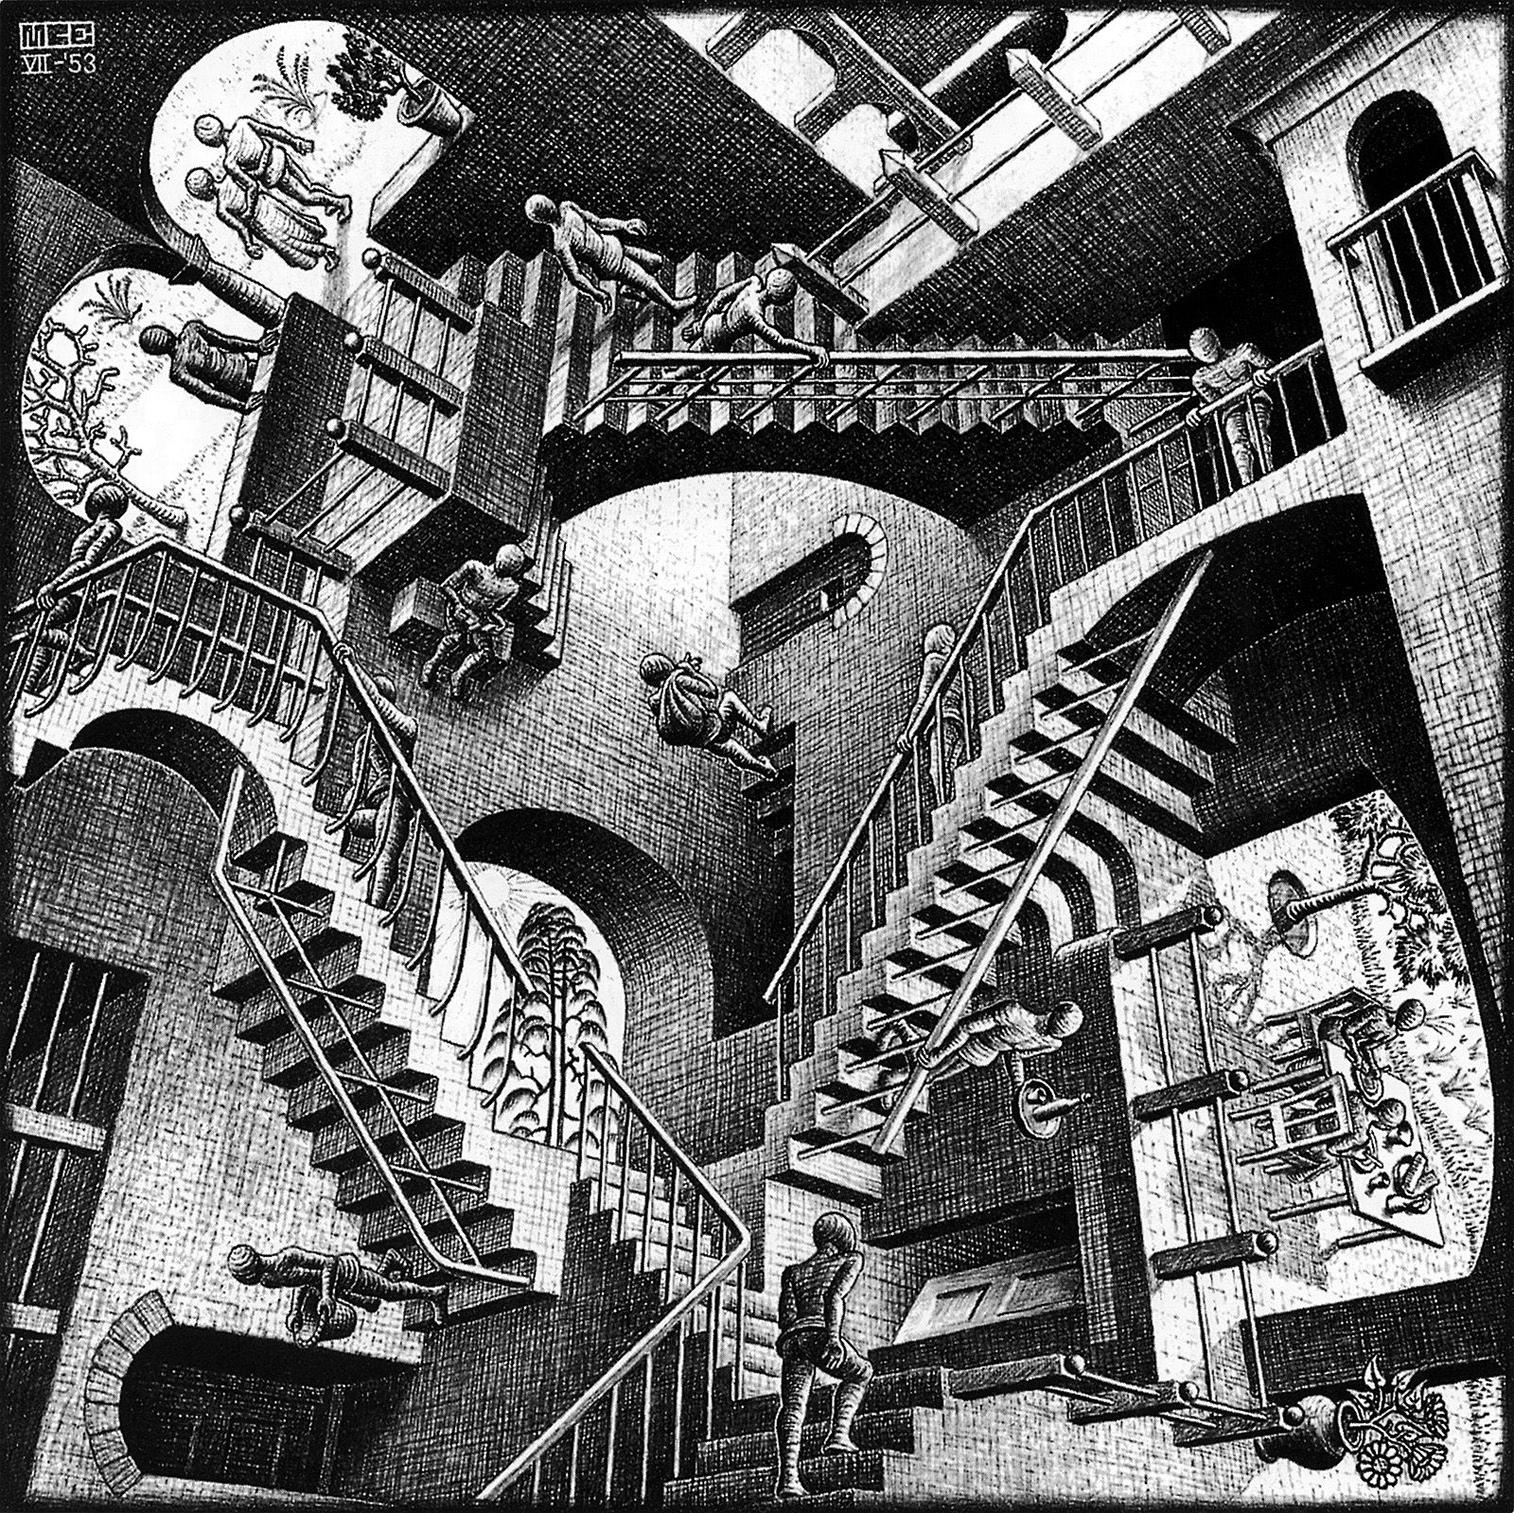 Relatividade - Escher